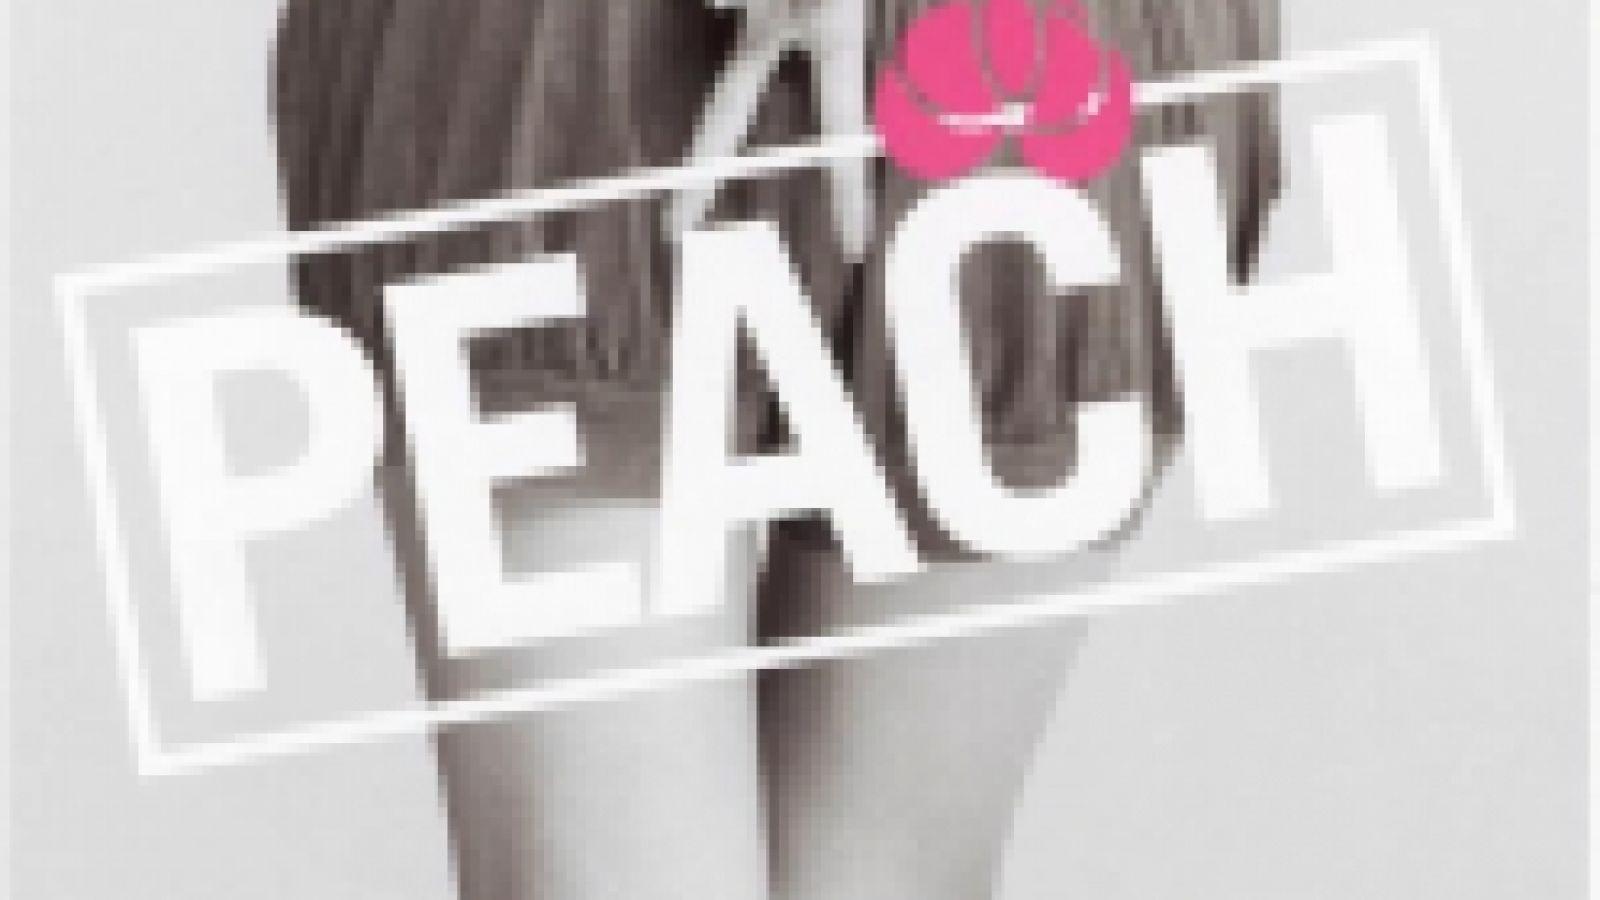 Otsuka Ai - PEACH/HEART © JaME - Oricon